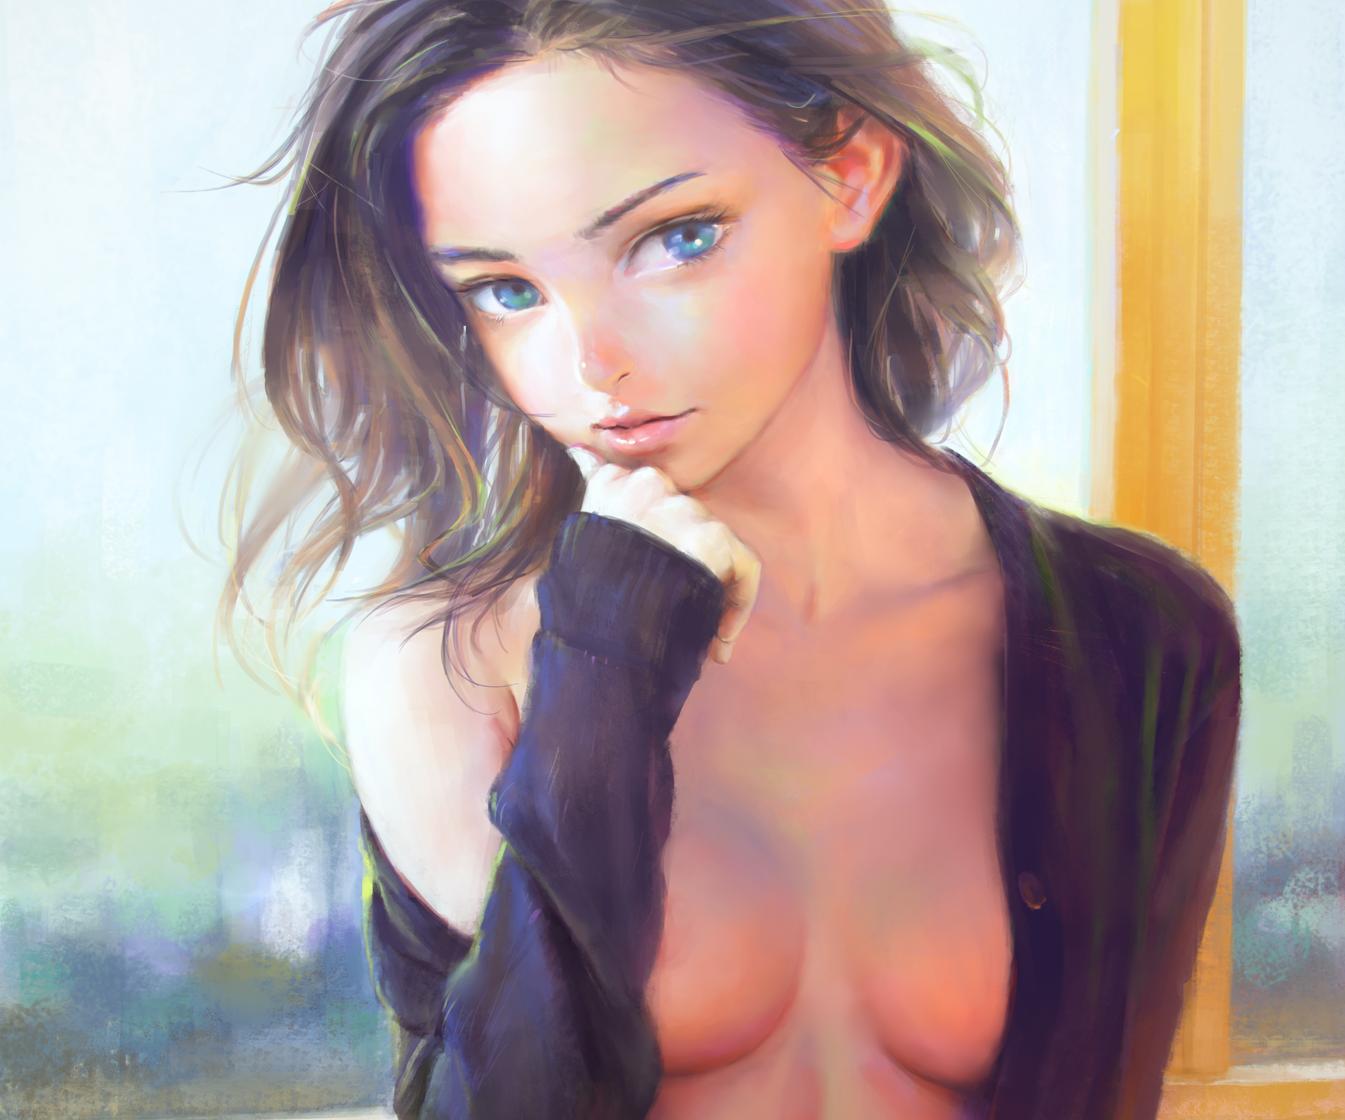 aqua eyes blue eyes breasts brown hair cleavage cropped long hair nababa naked shirt open shirt original realistic